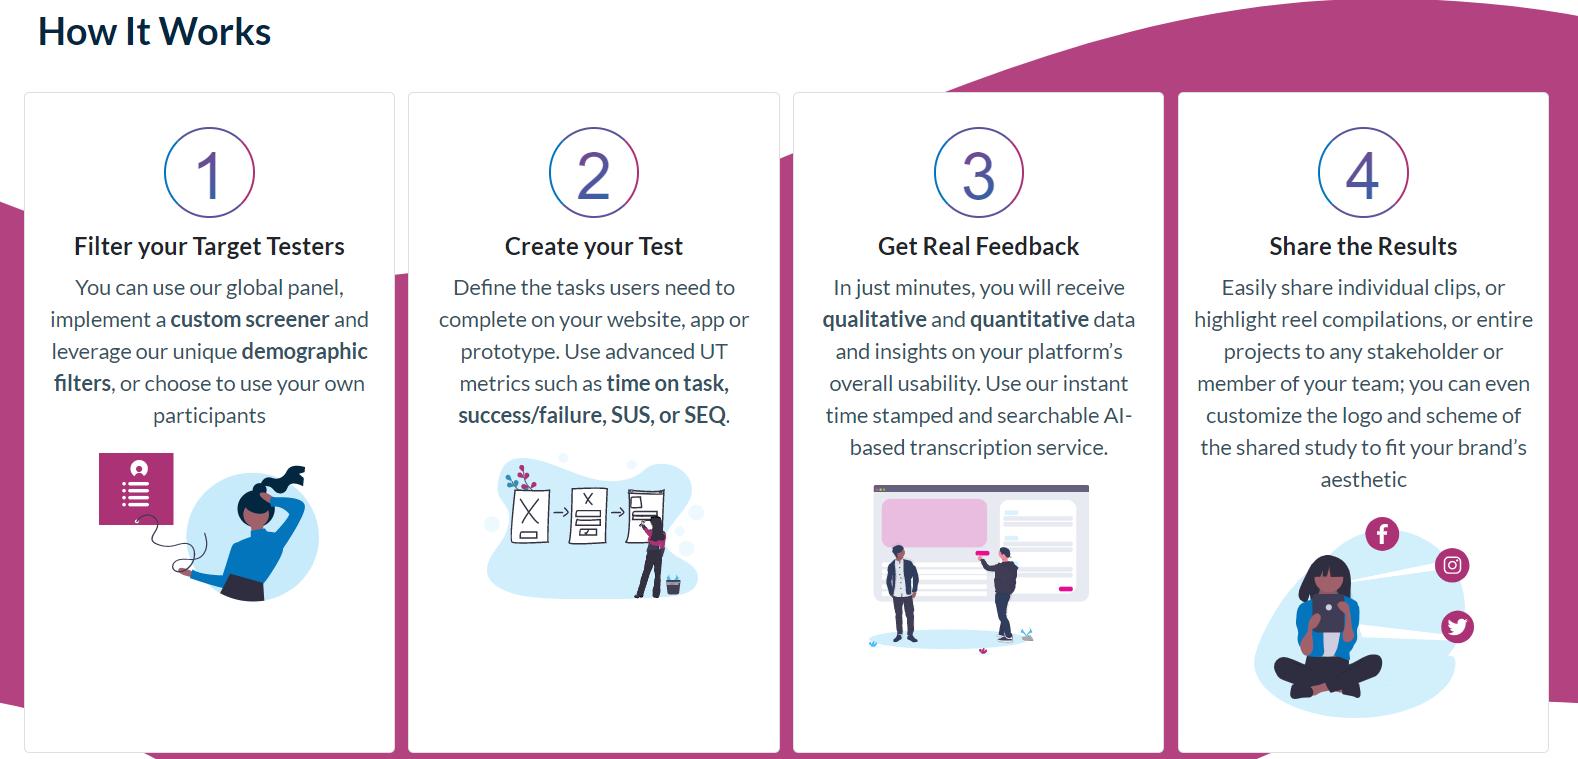 userlytics is a remote user testing platform